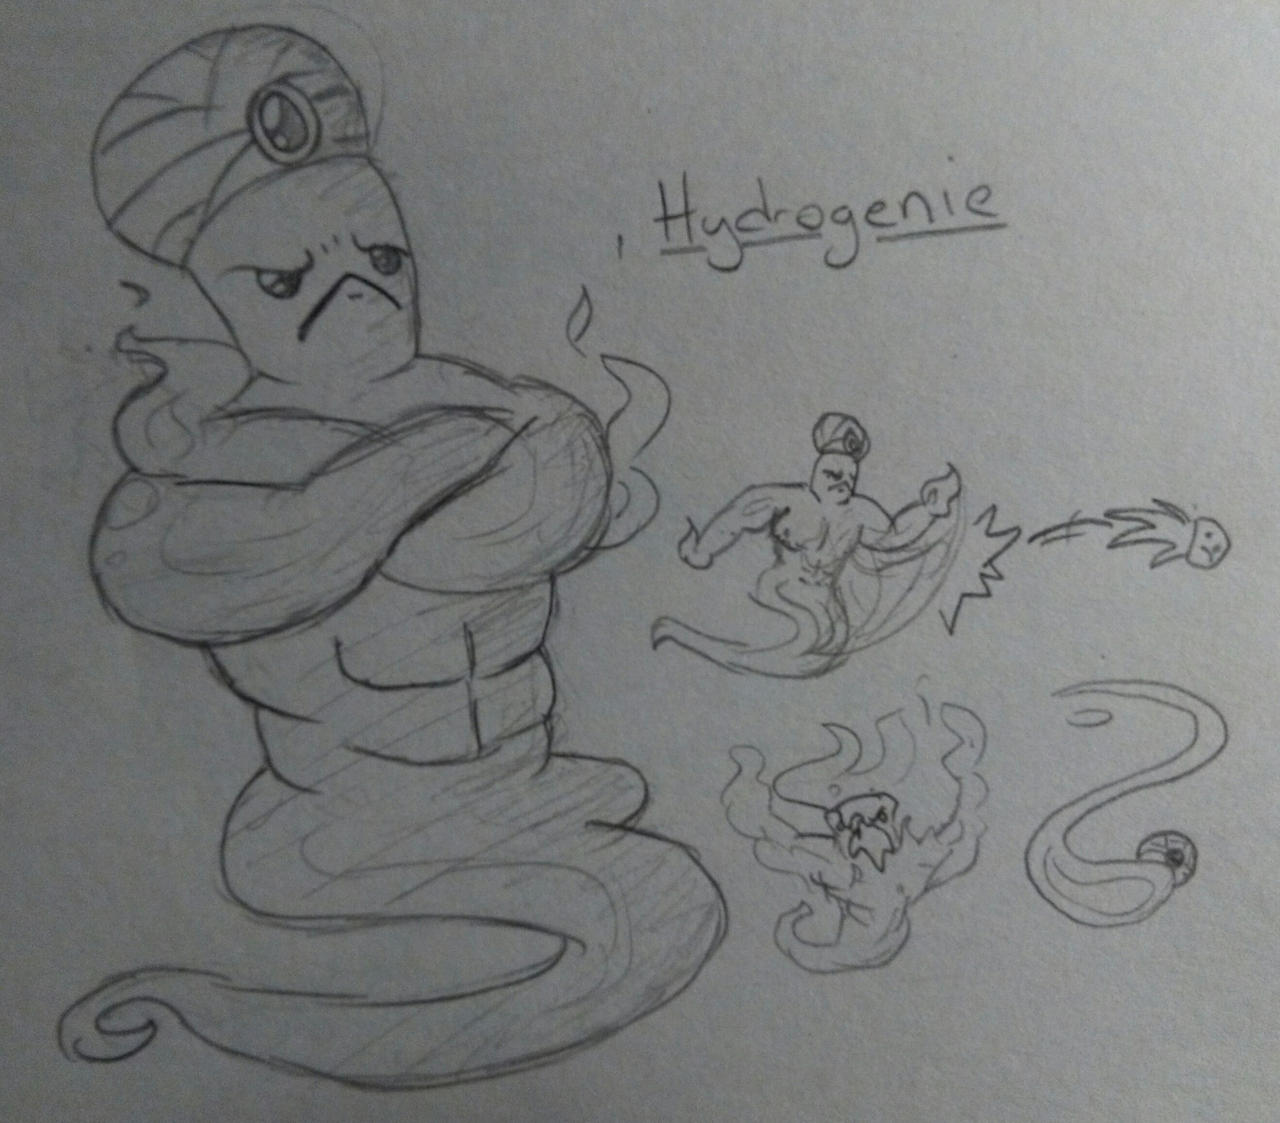 Hydrogenie (Enter the Gungeon Enemy Idea) by Nevernamed22 on